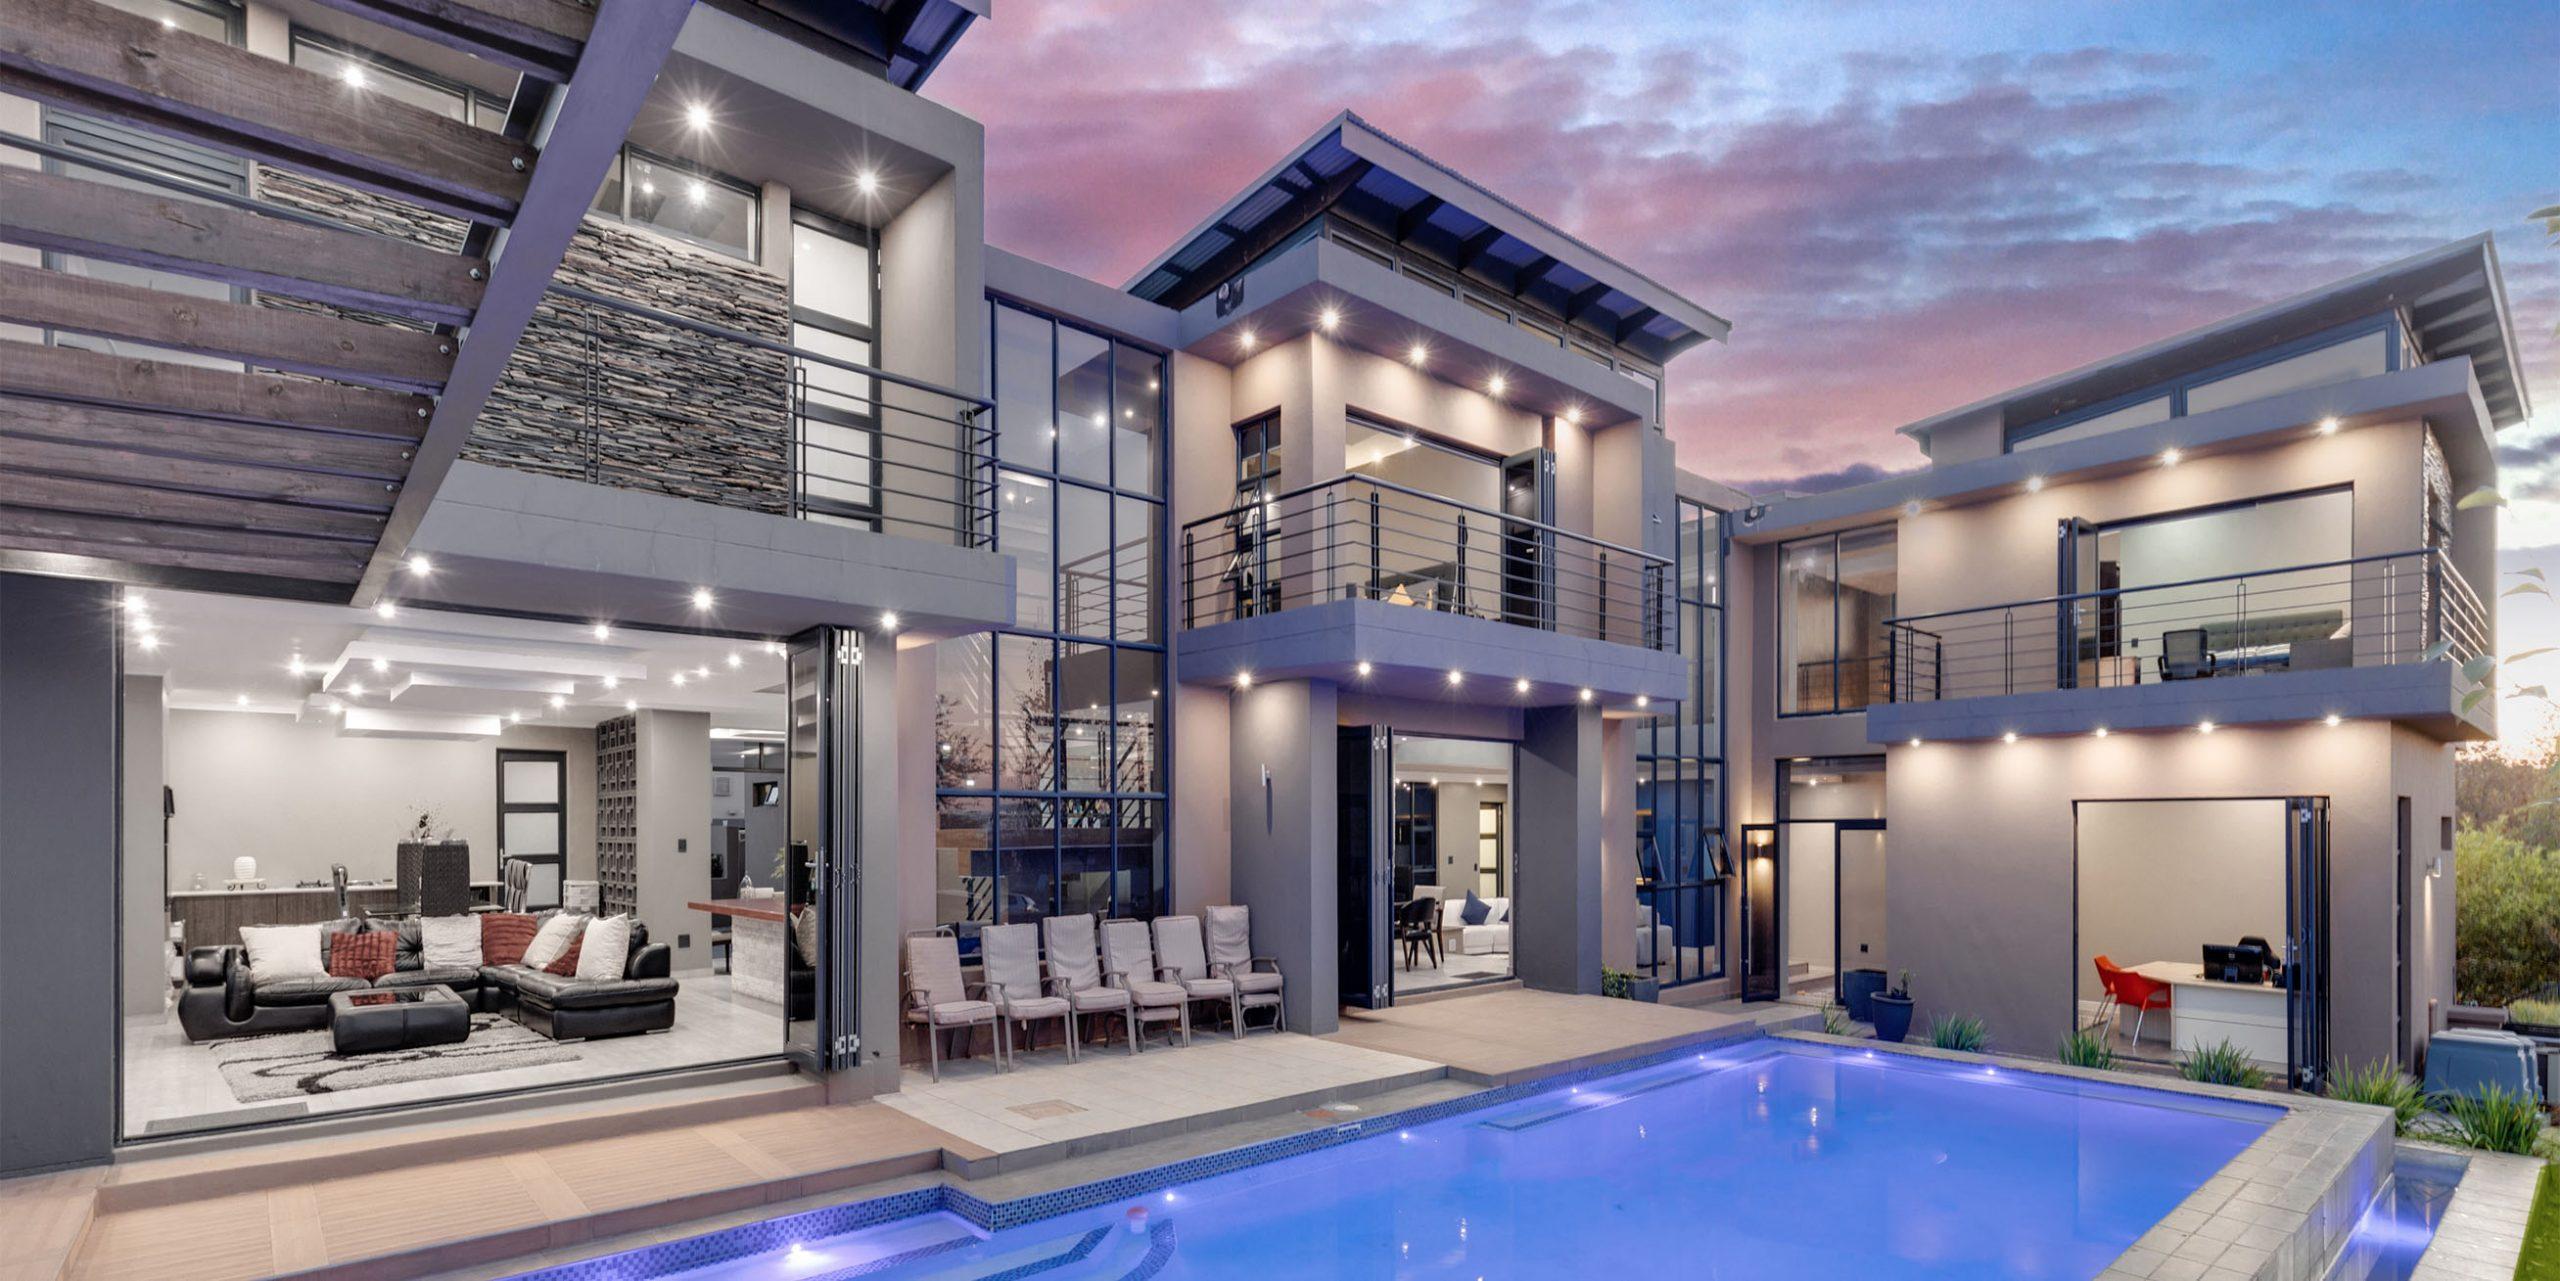 millennials luxury property